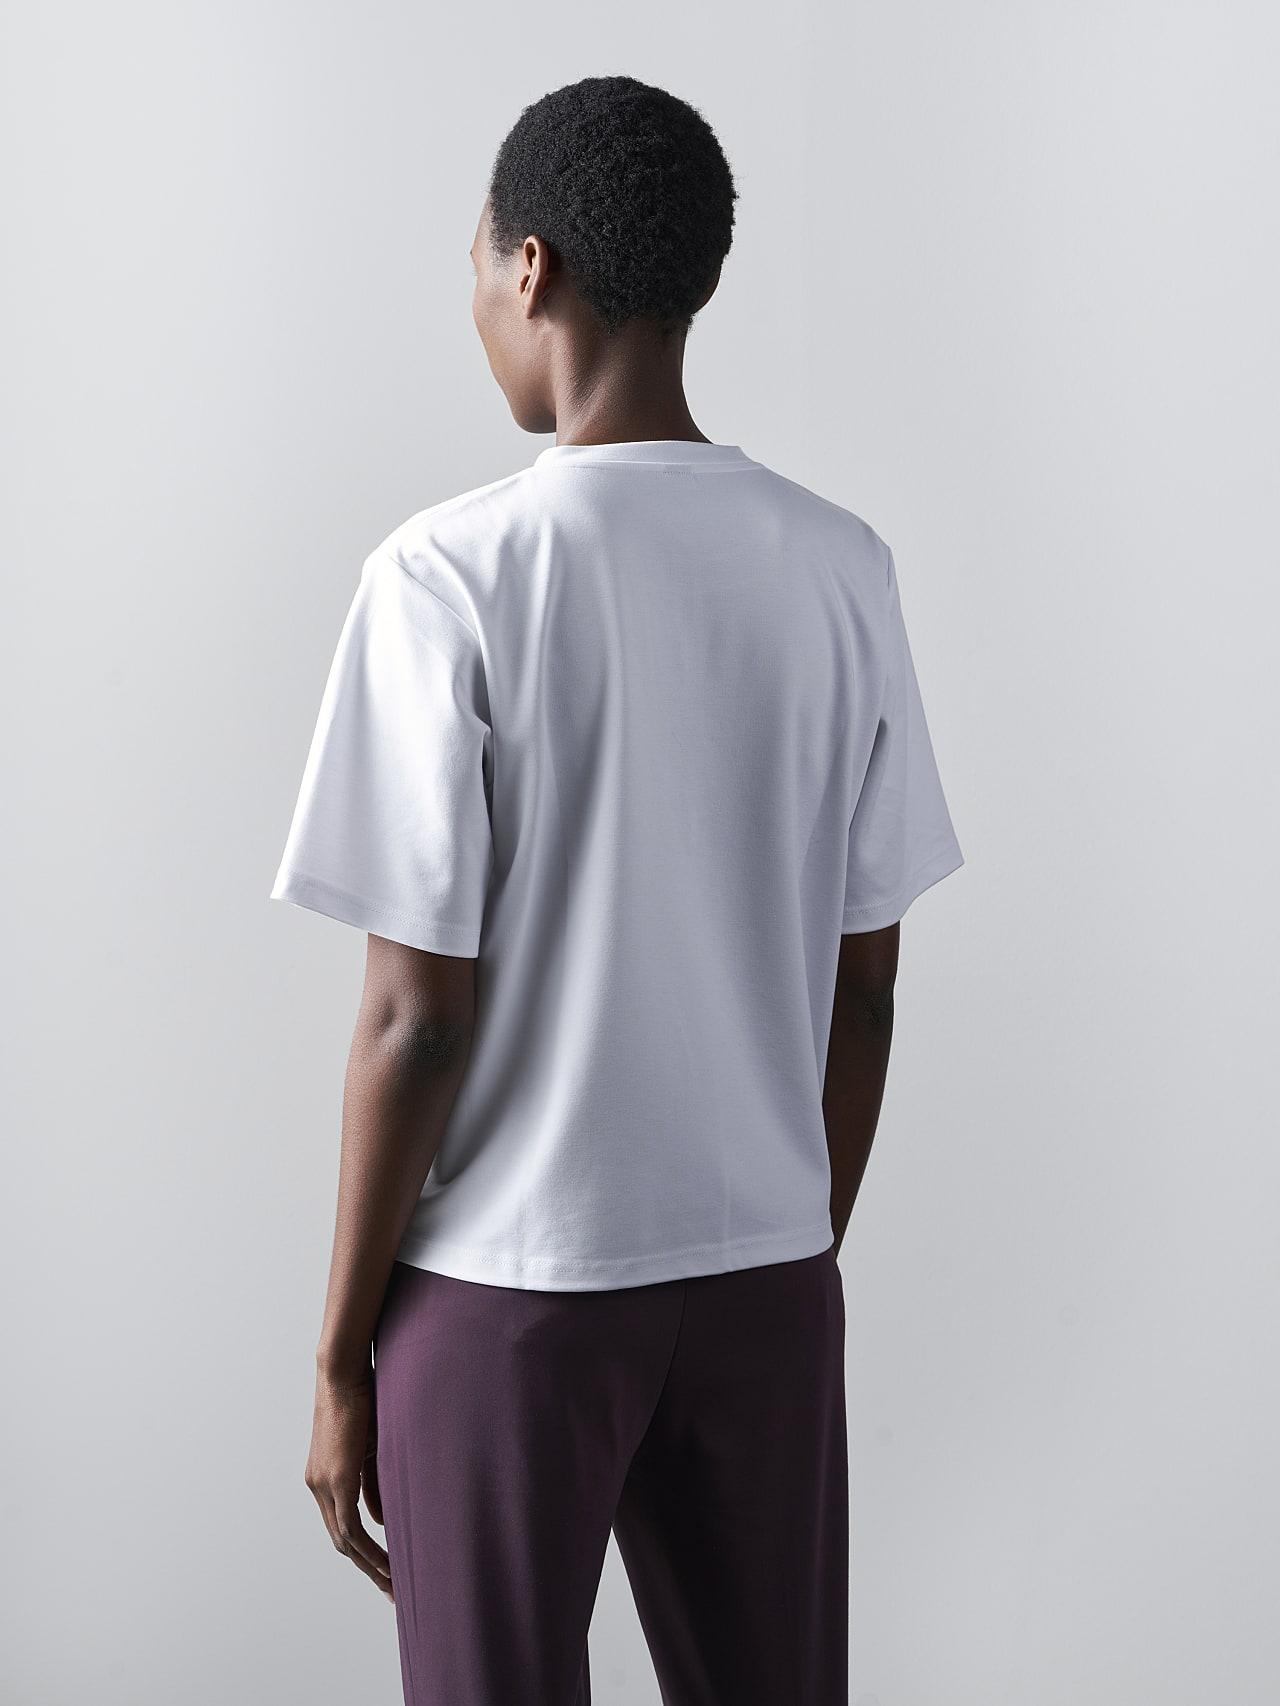 JASHU V1.Y5.02 Heavy-Weight Logo T-Shirt white Front Main Alpha Tauri